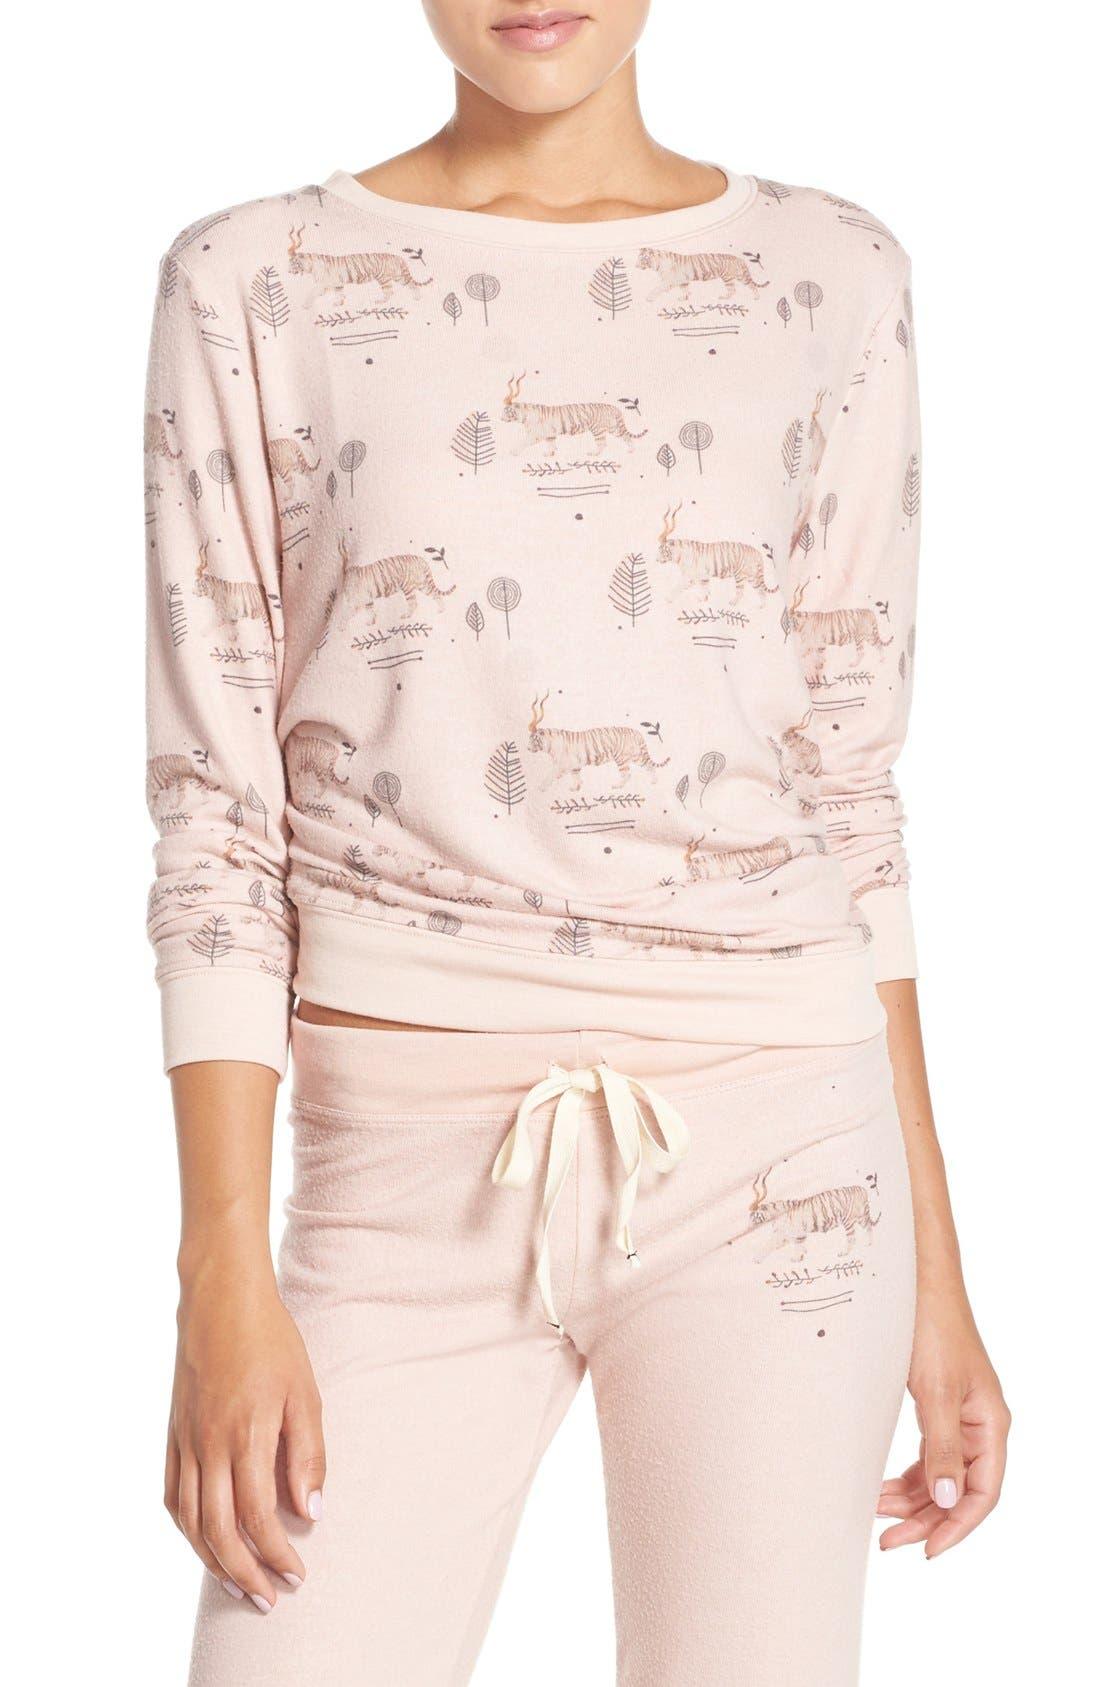 Main Image - All Things Fabulous Tiger Print Sweatshirt